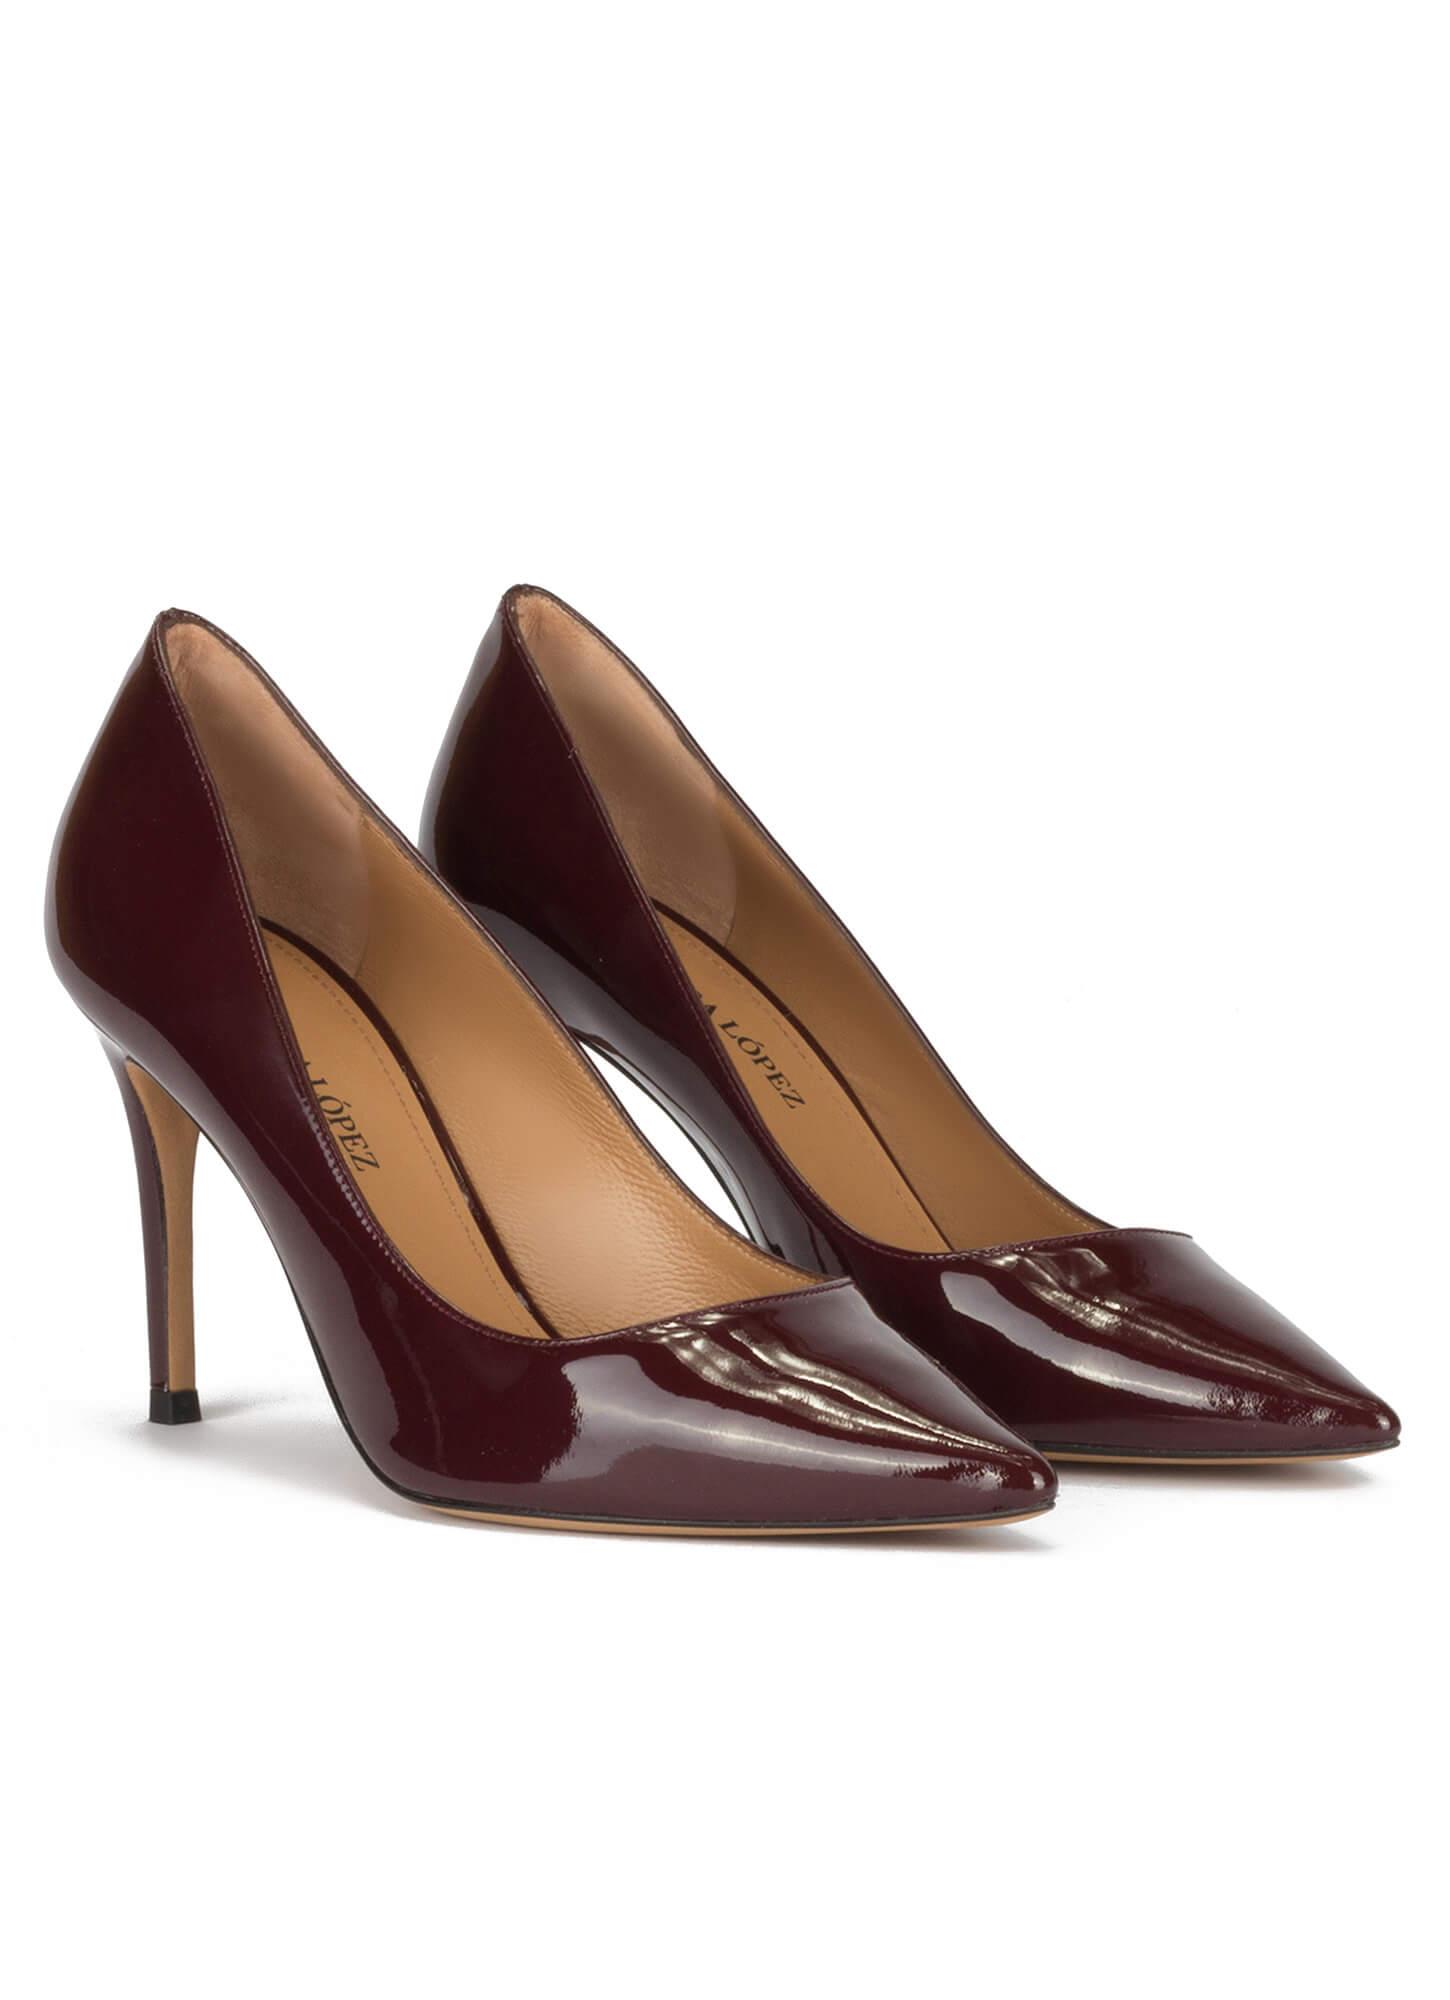 7cafcf360 Stiletto heel point-toe pumps in burgundy patent leather · Olga Pura López.  prev. next